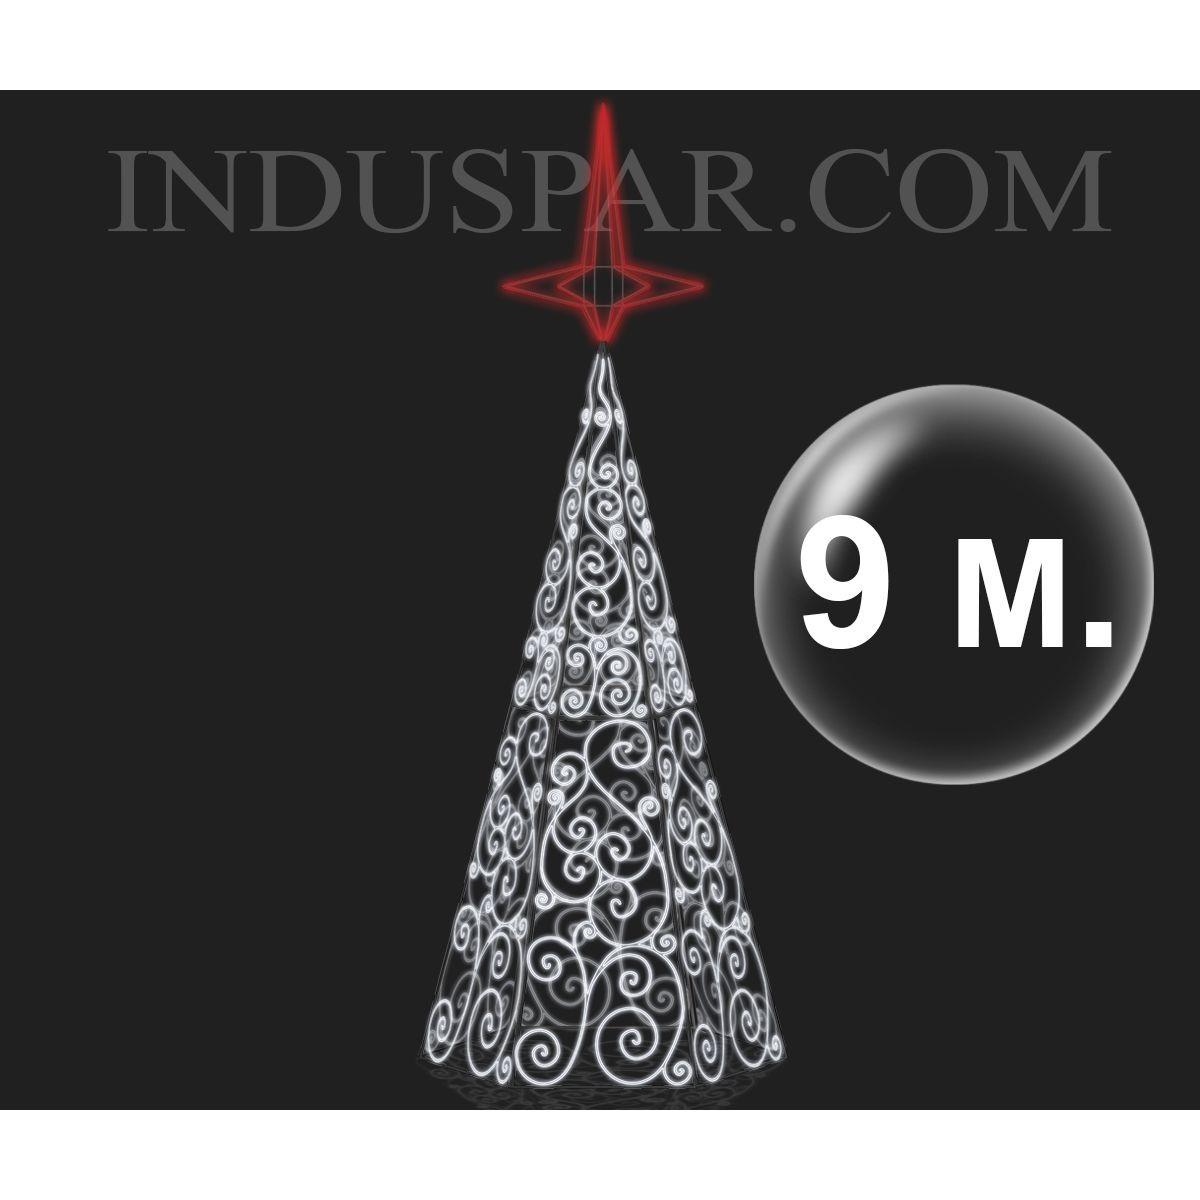 Arvore de Natal Gigante Mod 27 Led - Arabescos -  Altura 5 à 8 Mts